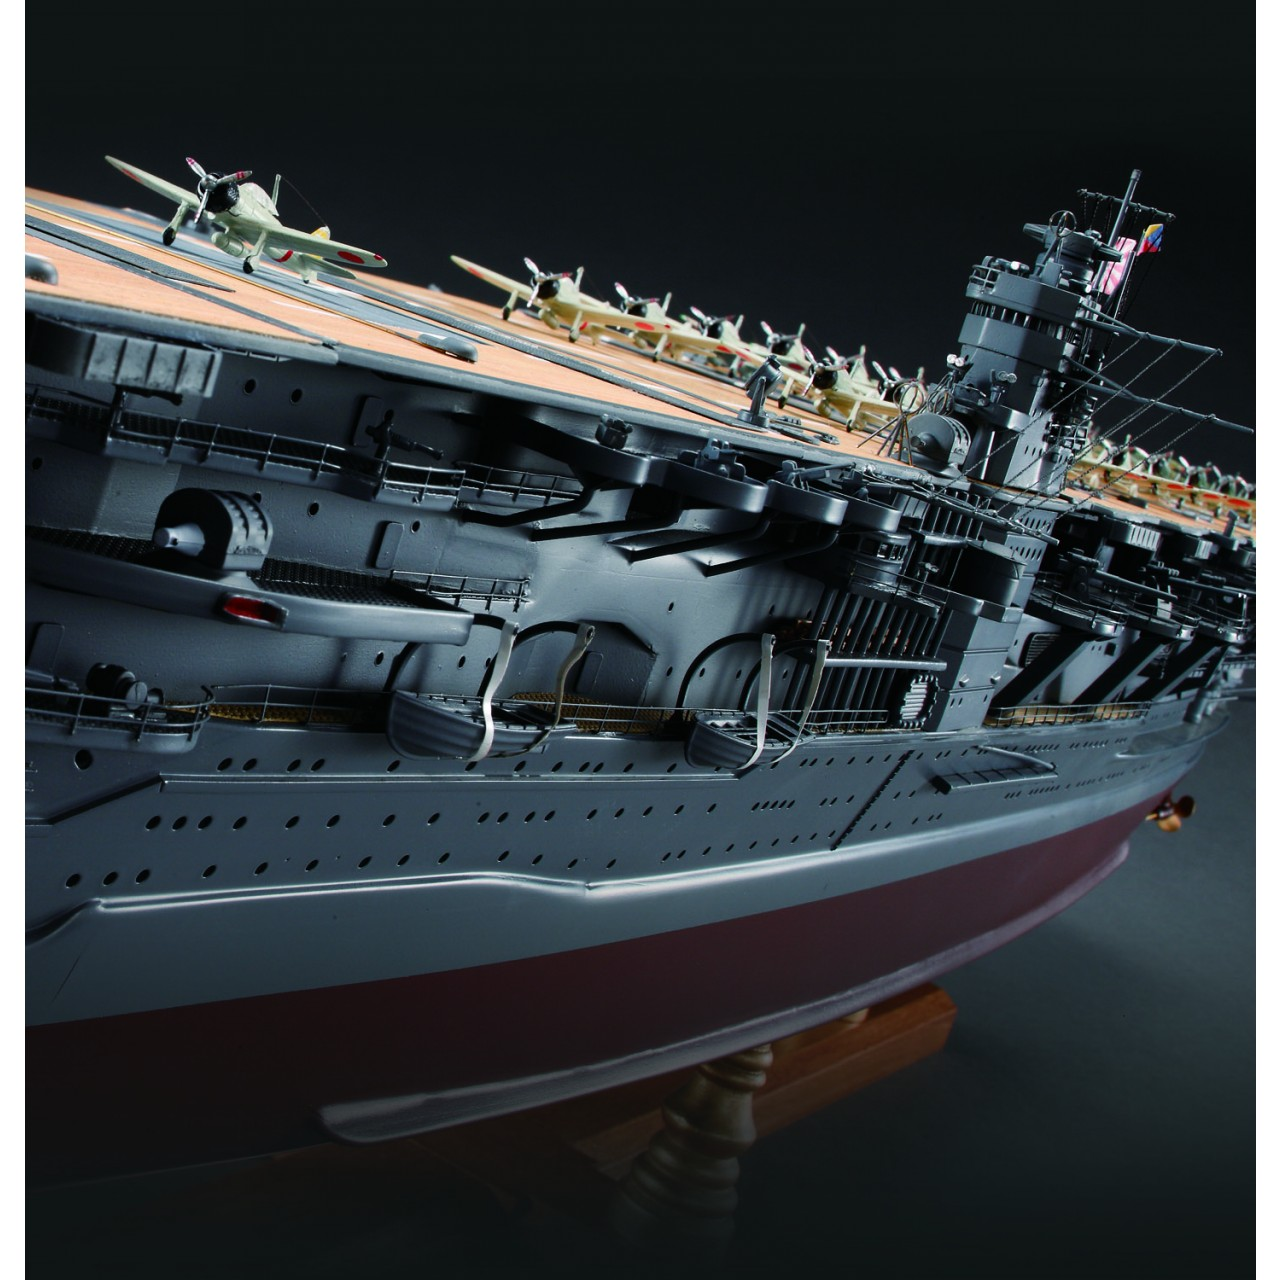 IJN TAKAO - Battleship Era - World of Warships official forum